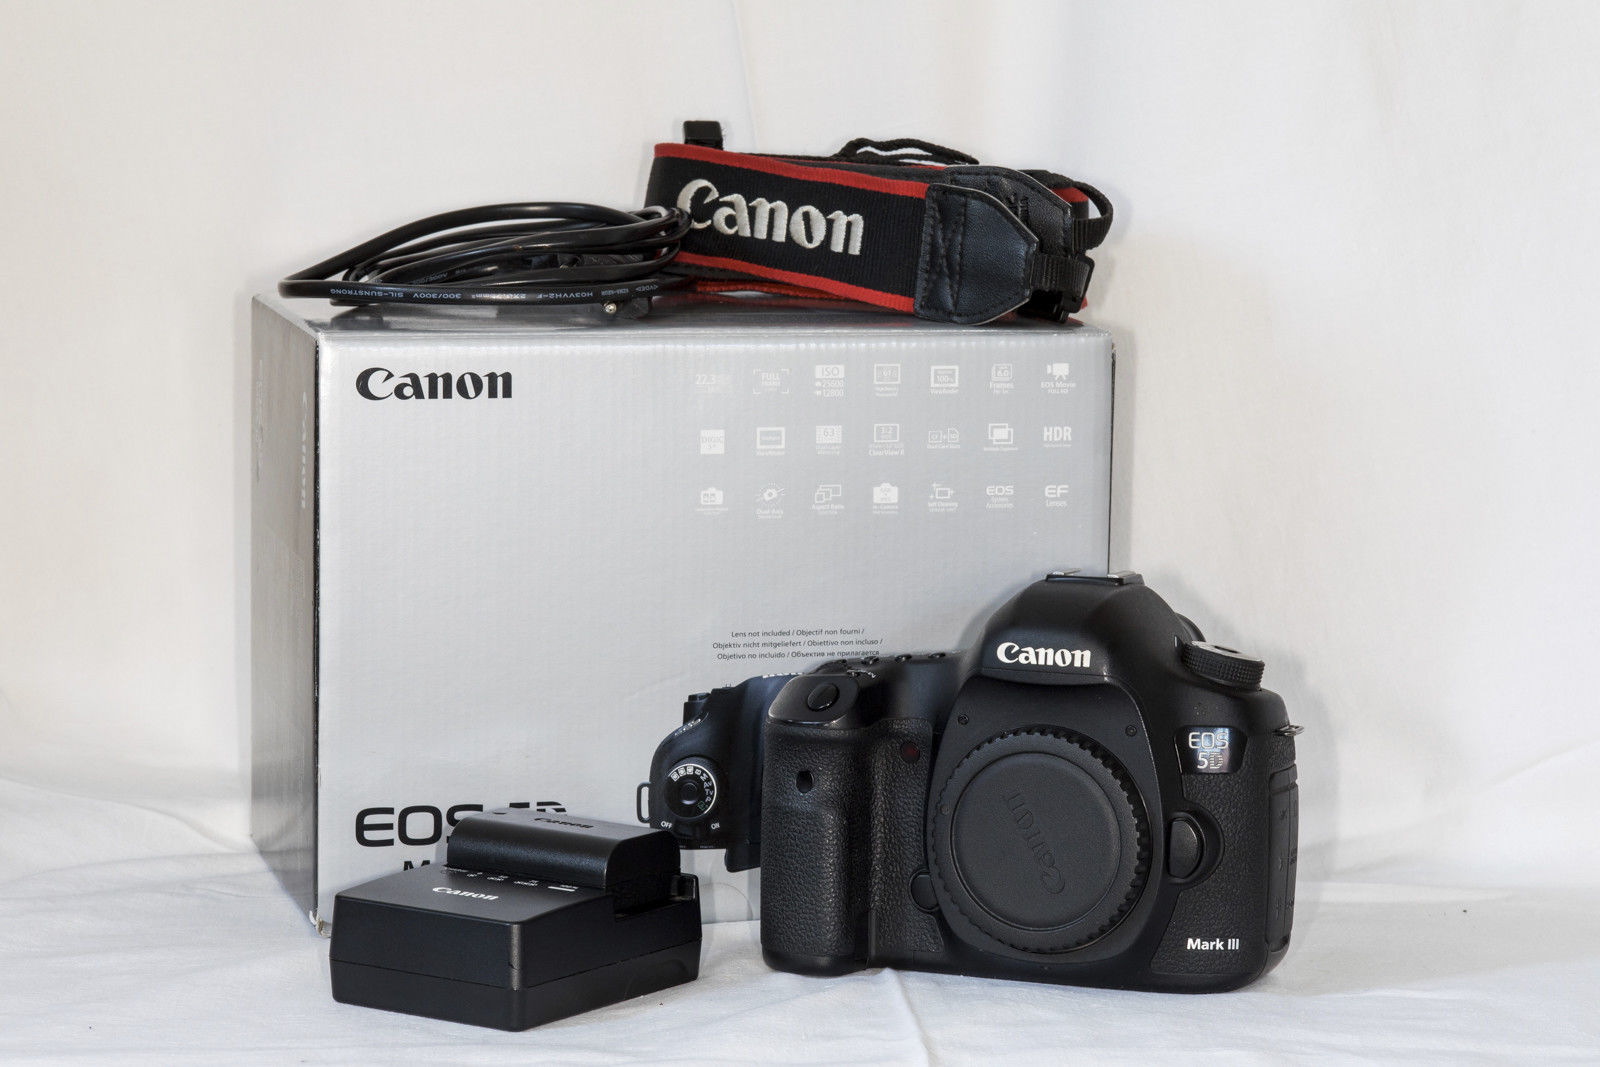 Canon Eos 5d Mark Iii Digital Slr Kamera Gehuse Vollformat Mit 6d Kit 24 105mm F 35 56 Is Stm Wifi And Gps 223 Mp